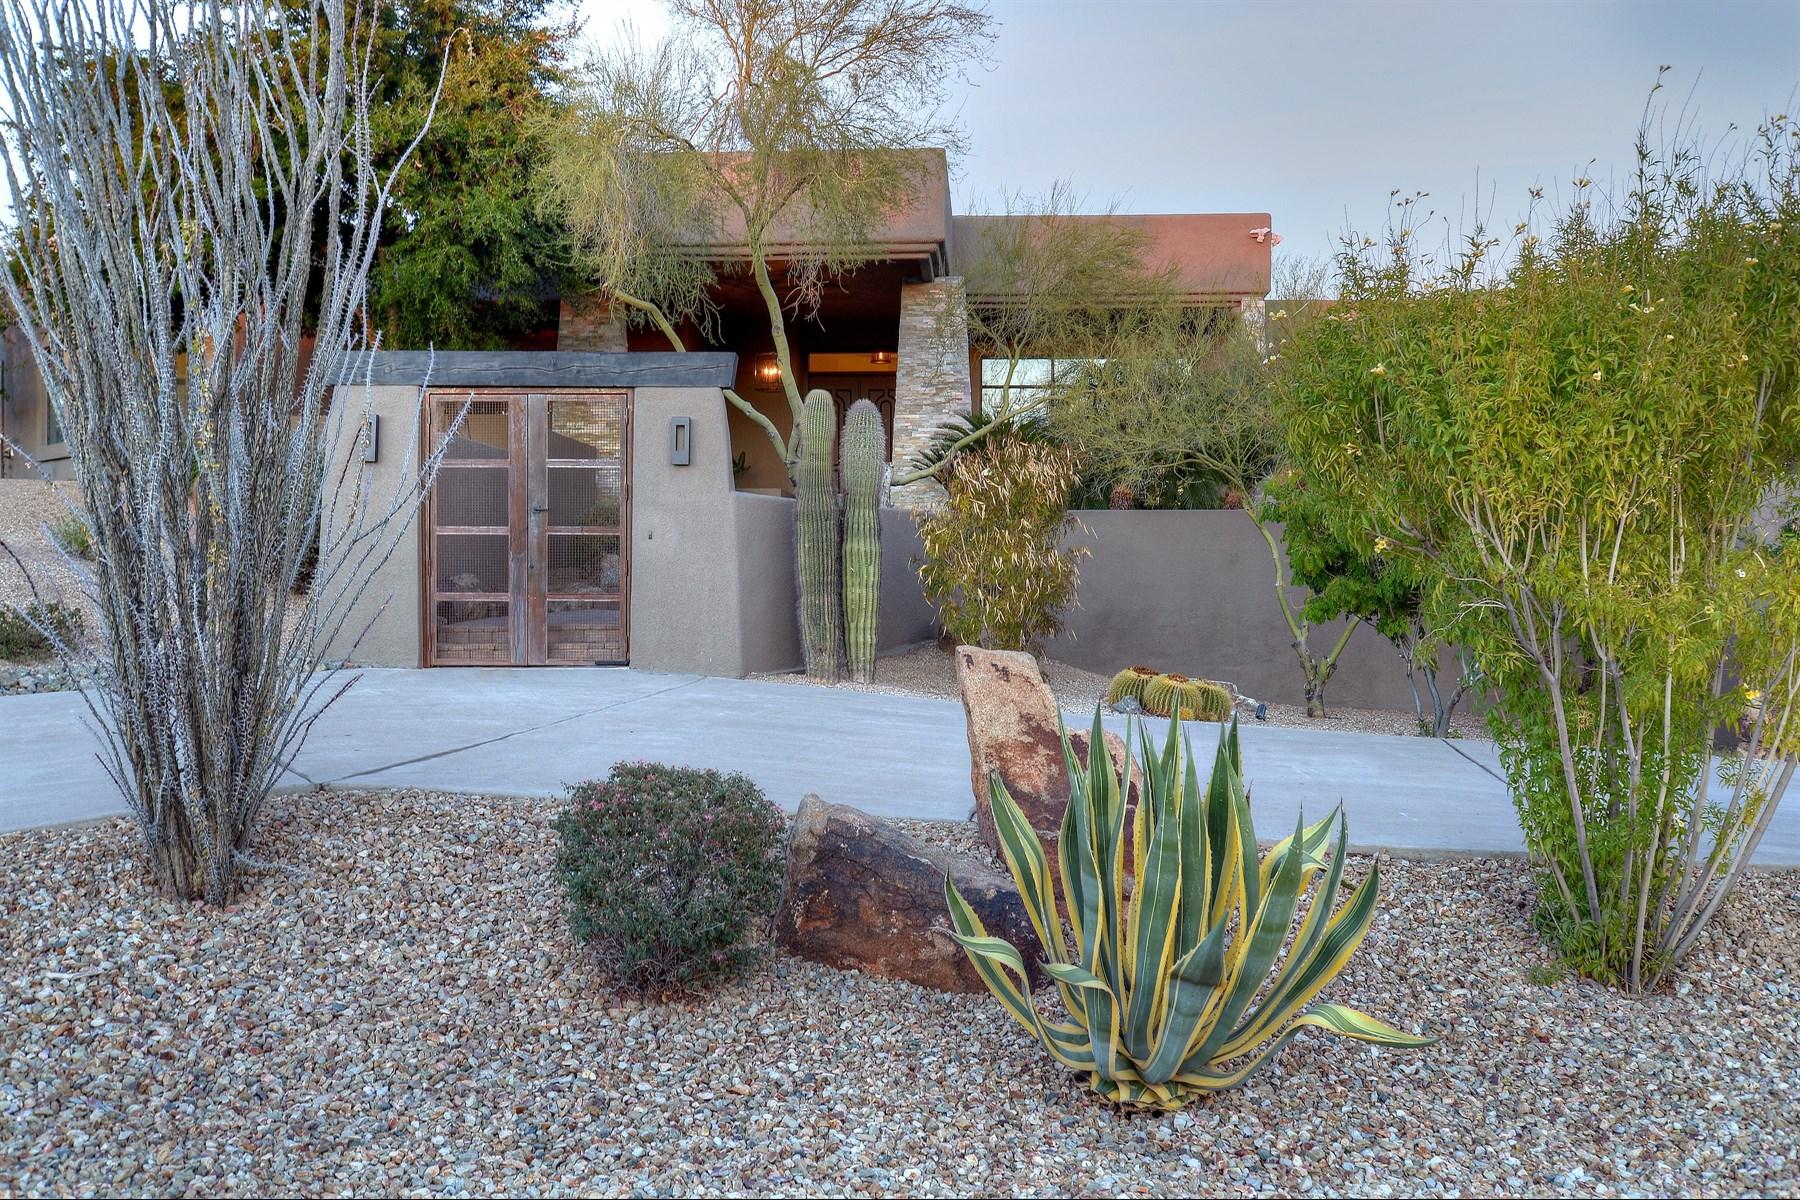 独户住宅 为 销售 在 Gorgeous remodel with breathtaking views 24200 N ALMA SCHOOL RD 6 斯科茨代尔, 亚利桑那州 85255 美国